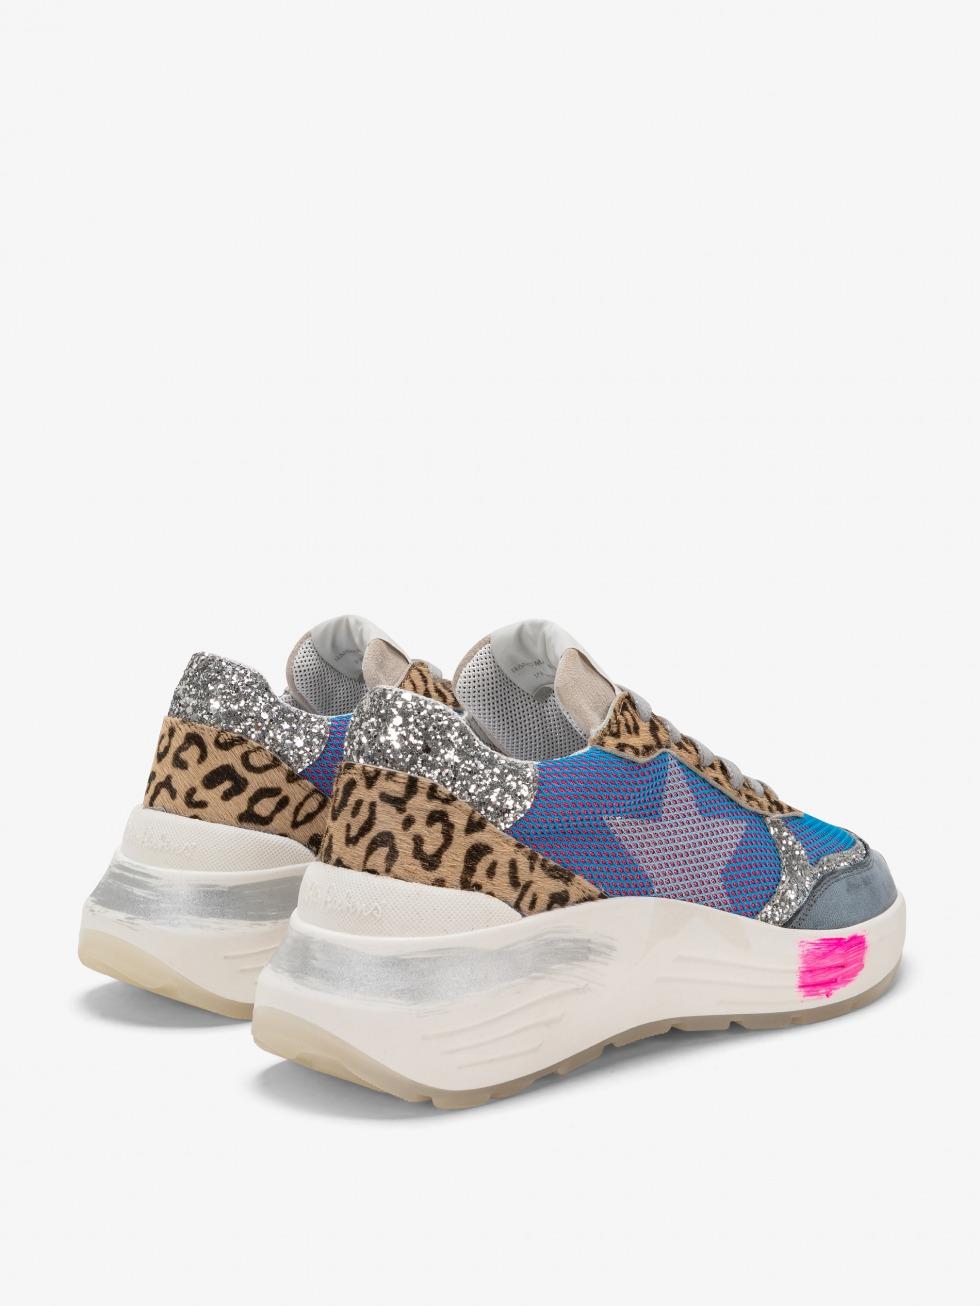 Stinger Chunky Sneakers Pop - Star